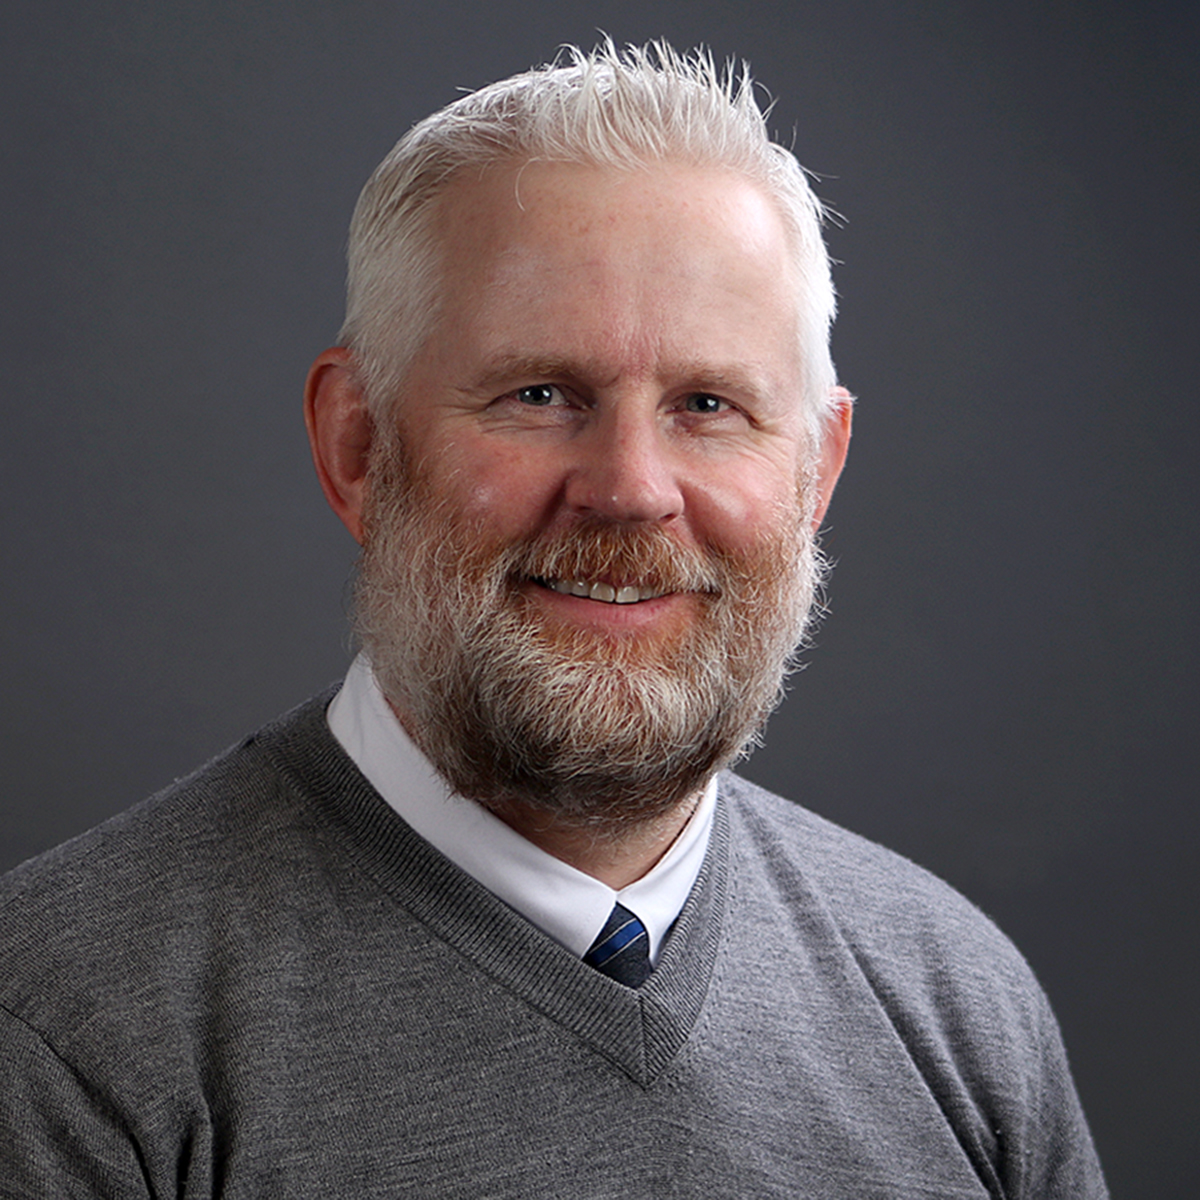 Profile picture of Paul Kononoff